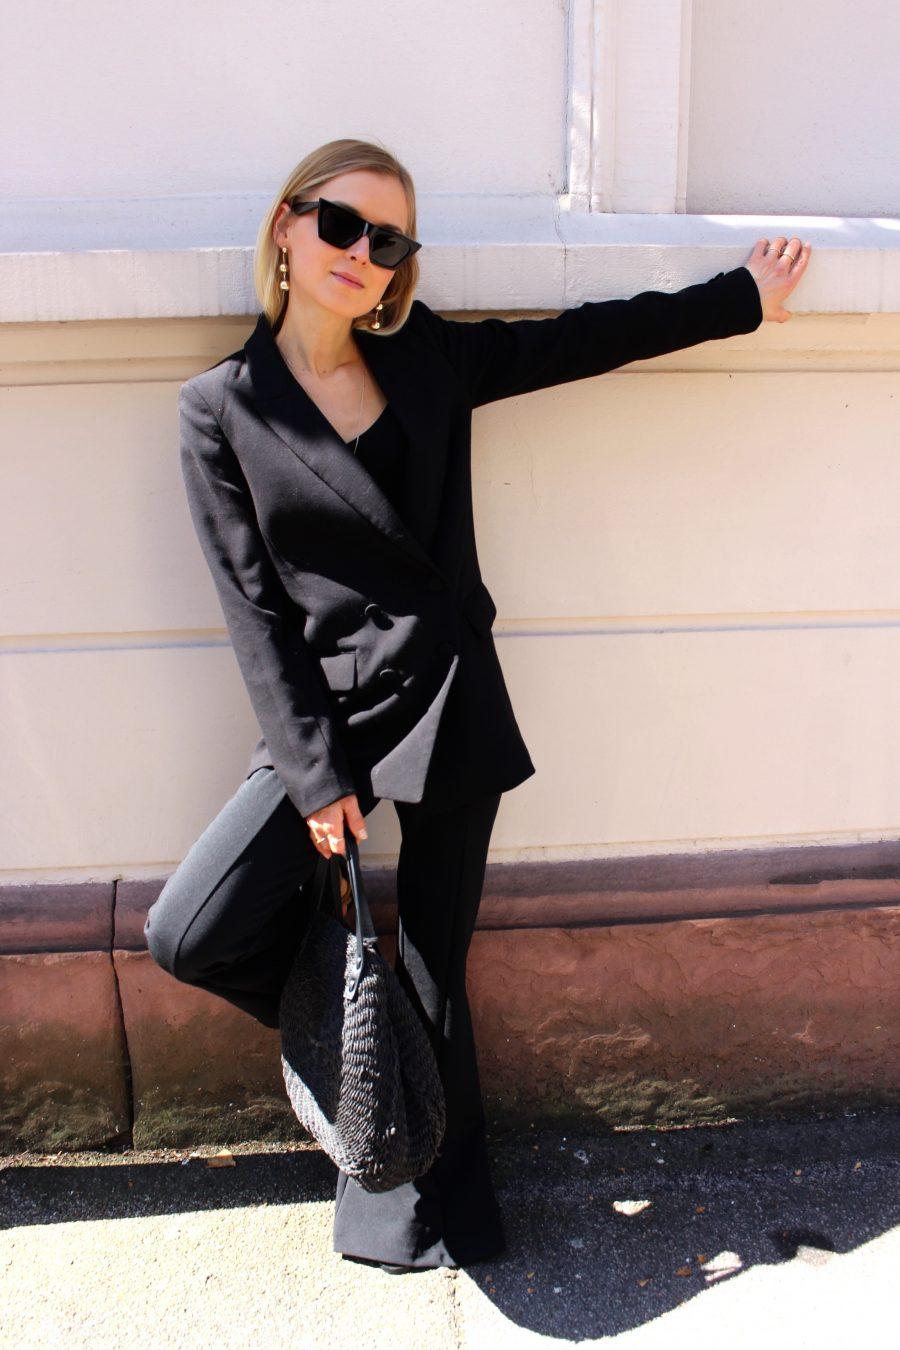 céline edge sunglasses